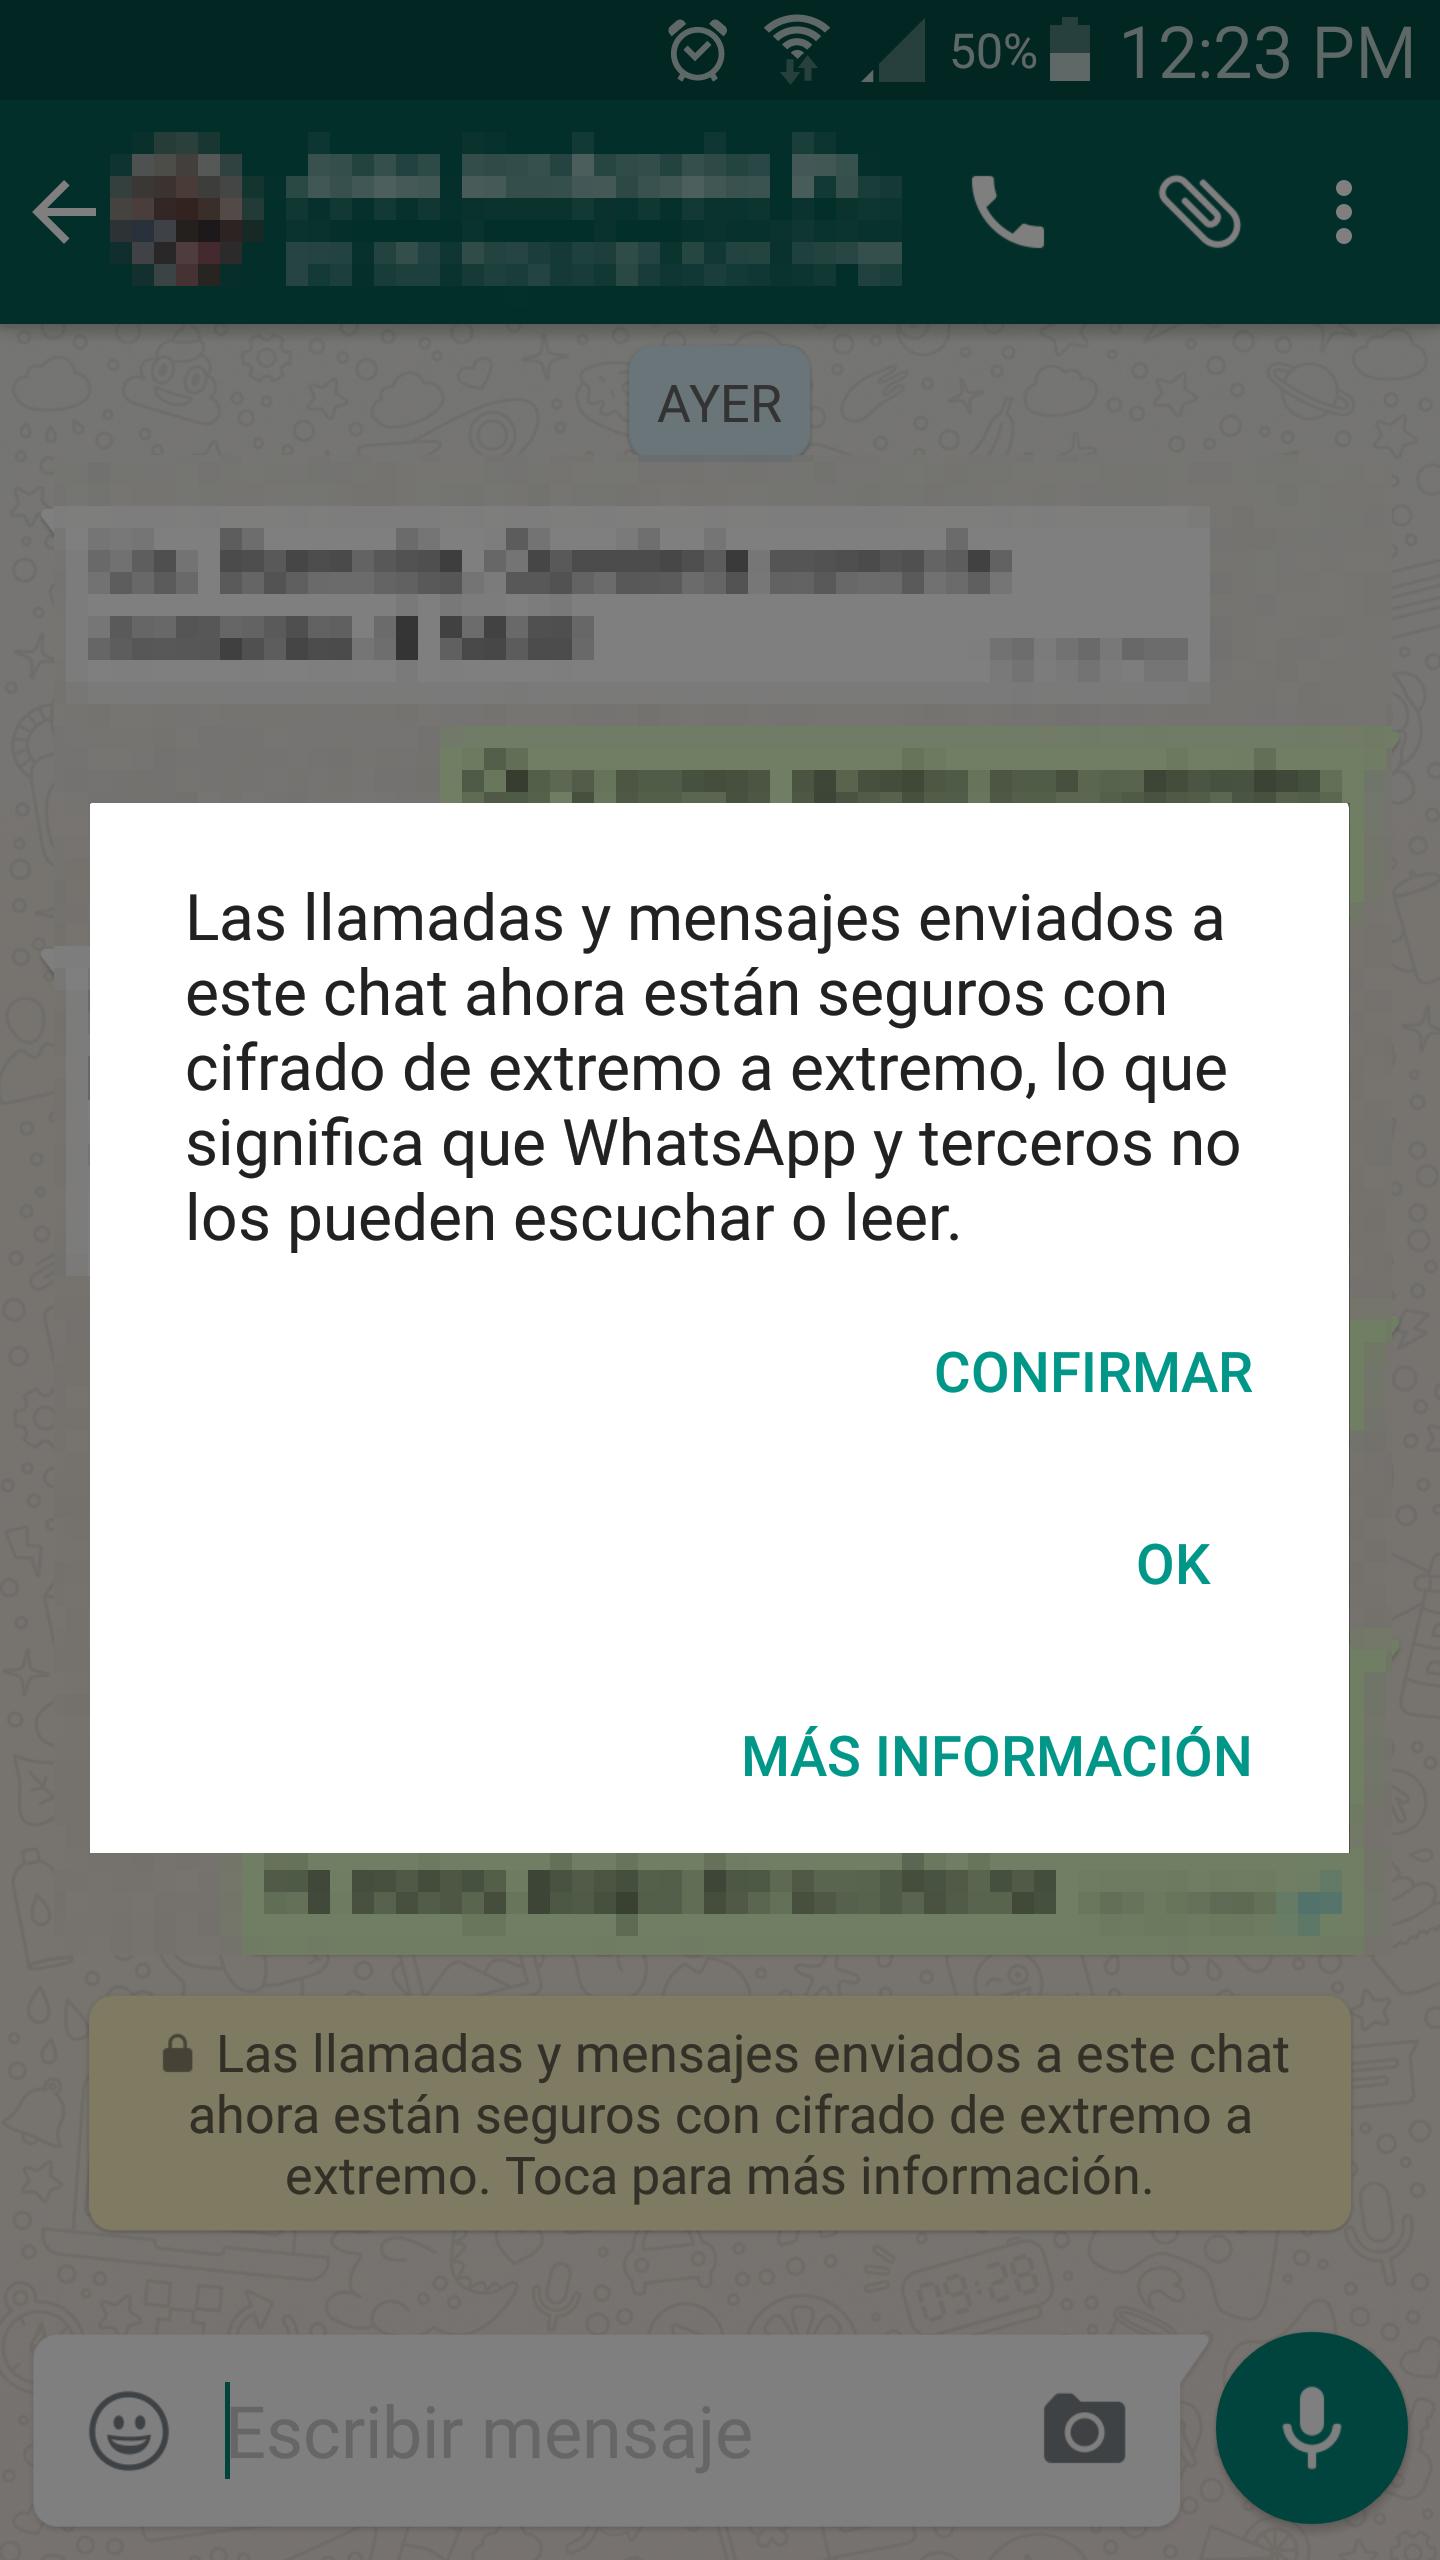 Whatsapp-cifrado-extremo-a-extremo-2